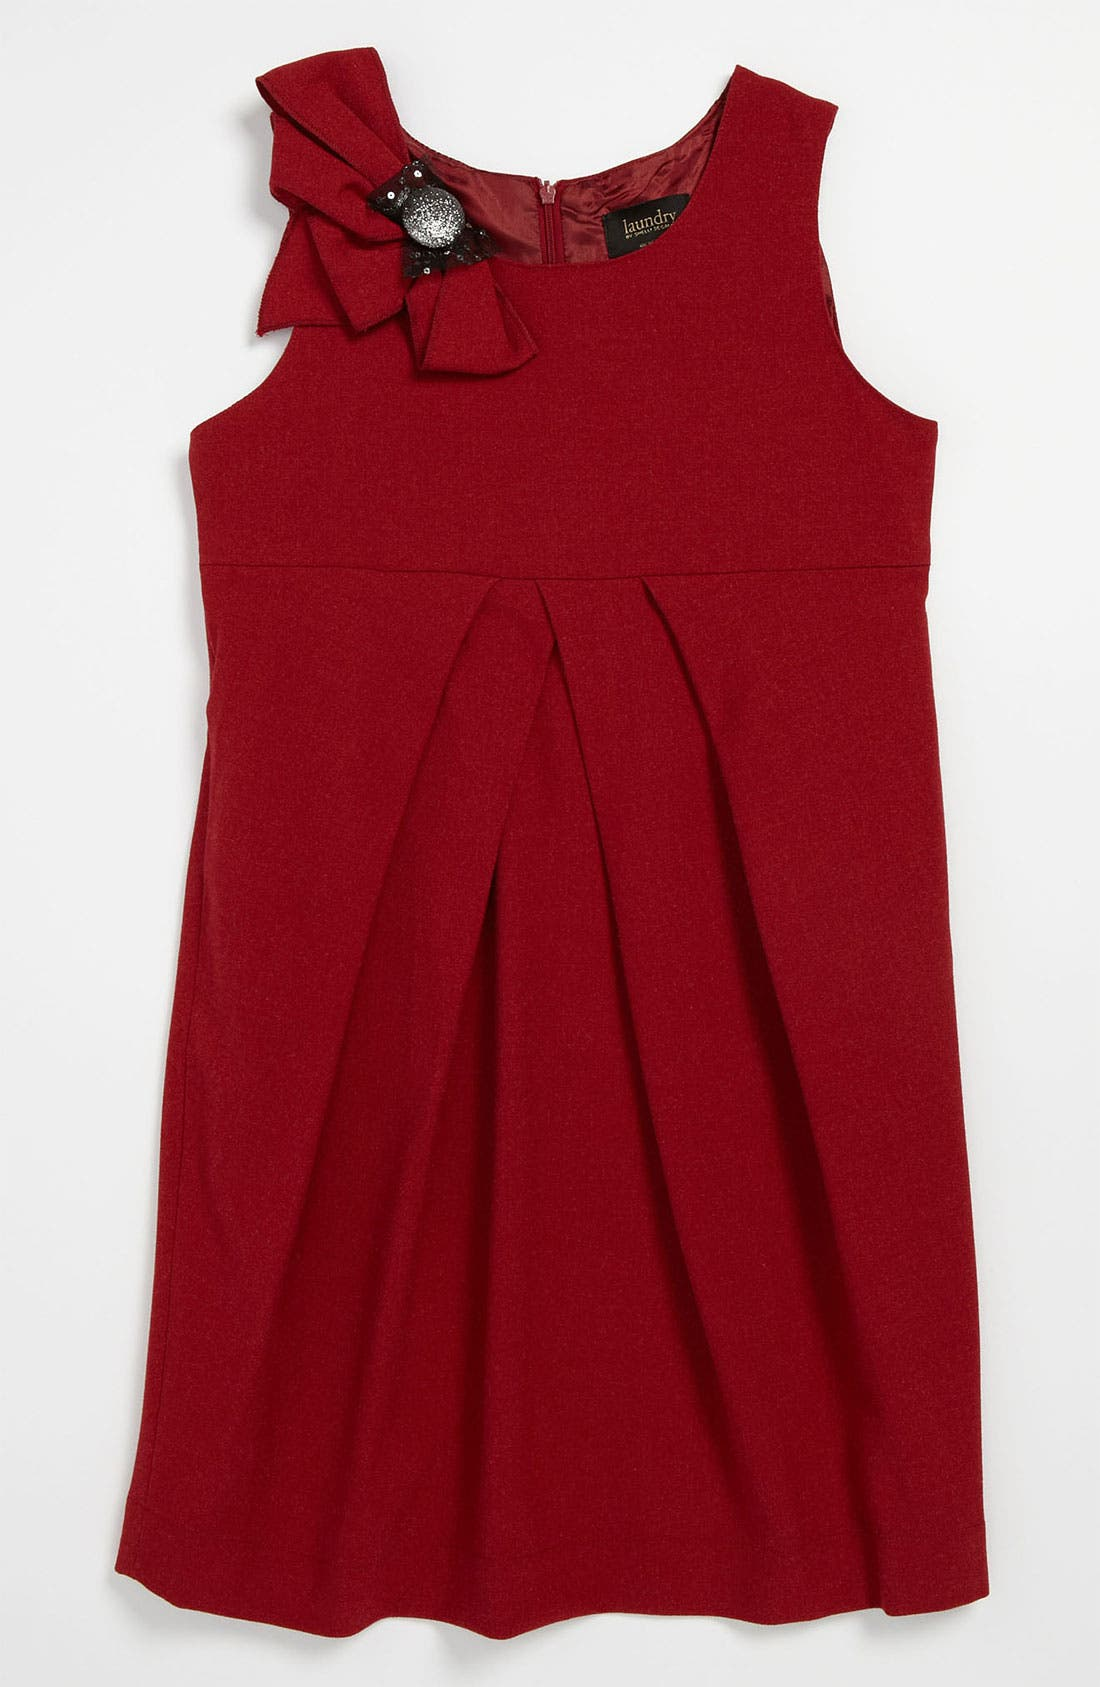 Alternate Image 1 Selected - Laundry by Shelli Segal 'Chelsea' Dress (Big Girls)